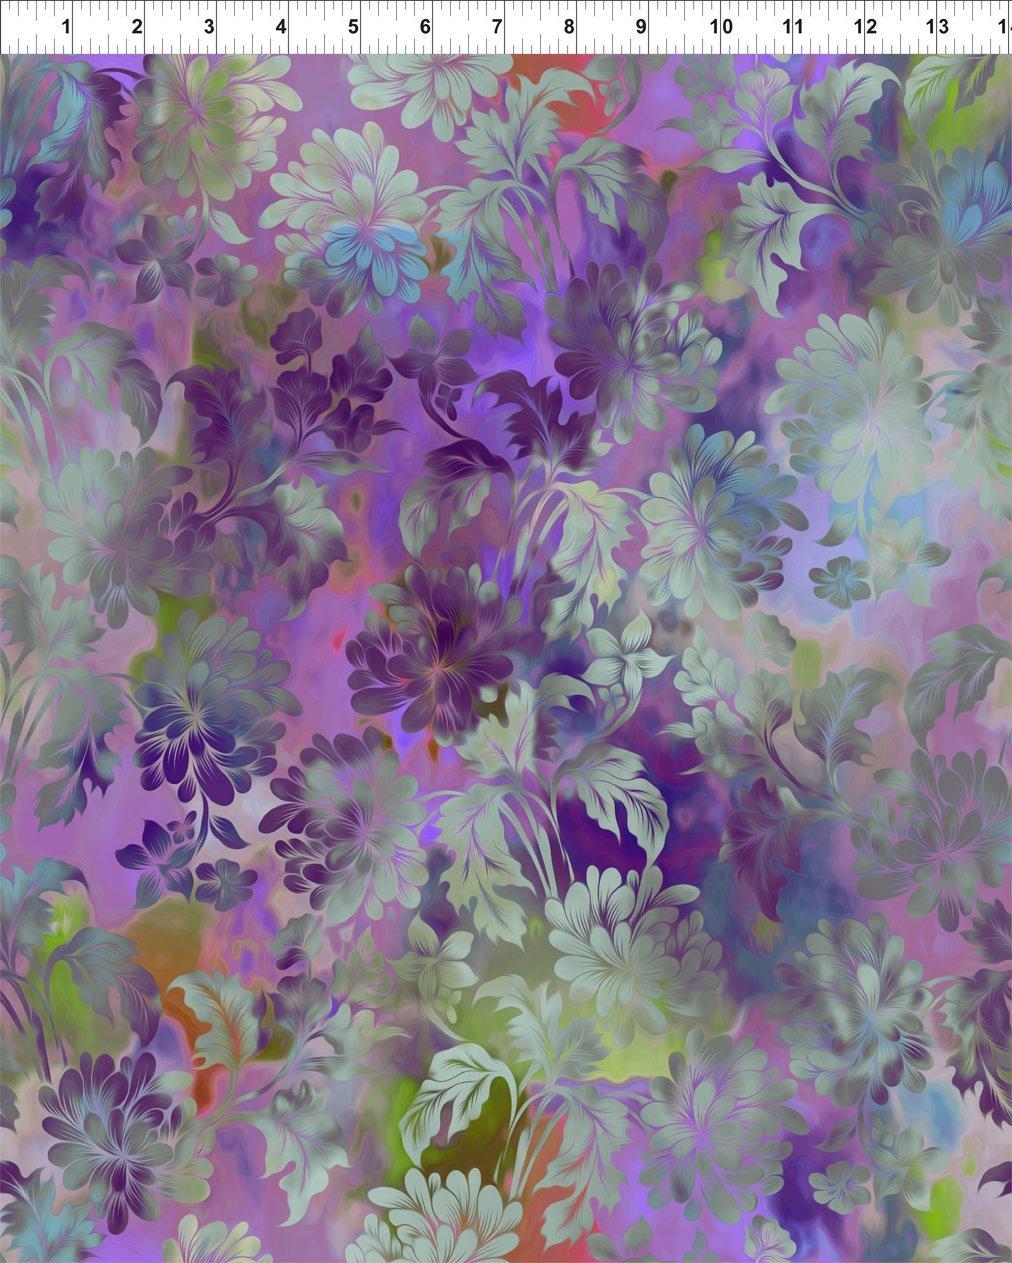 Diaphanous-aqua flowers on multi colorwash background